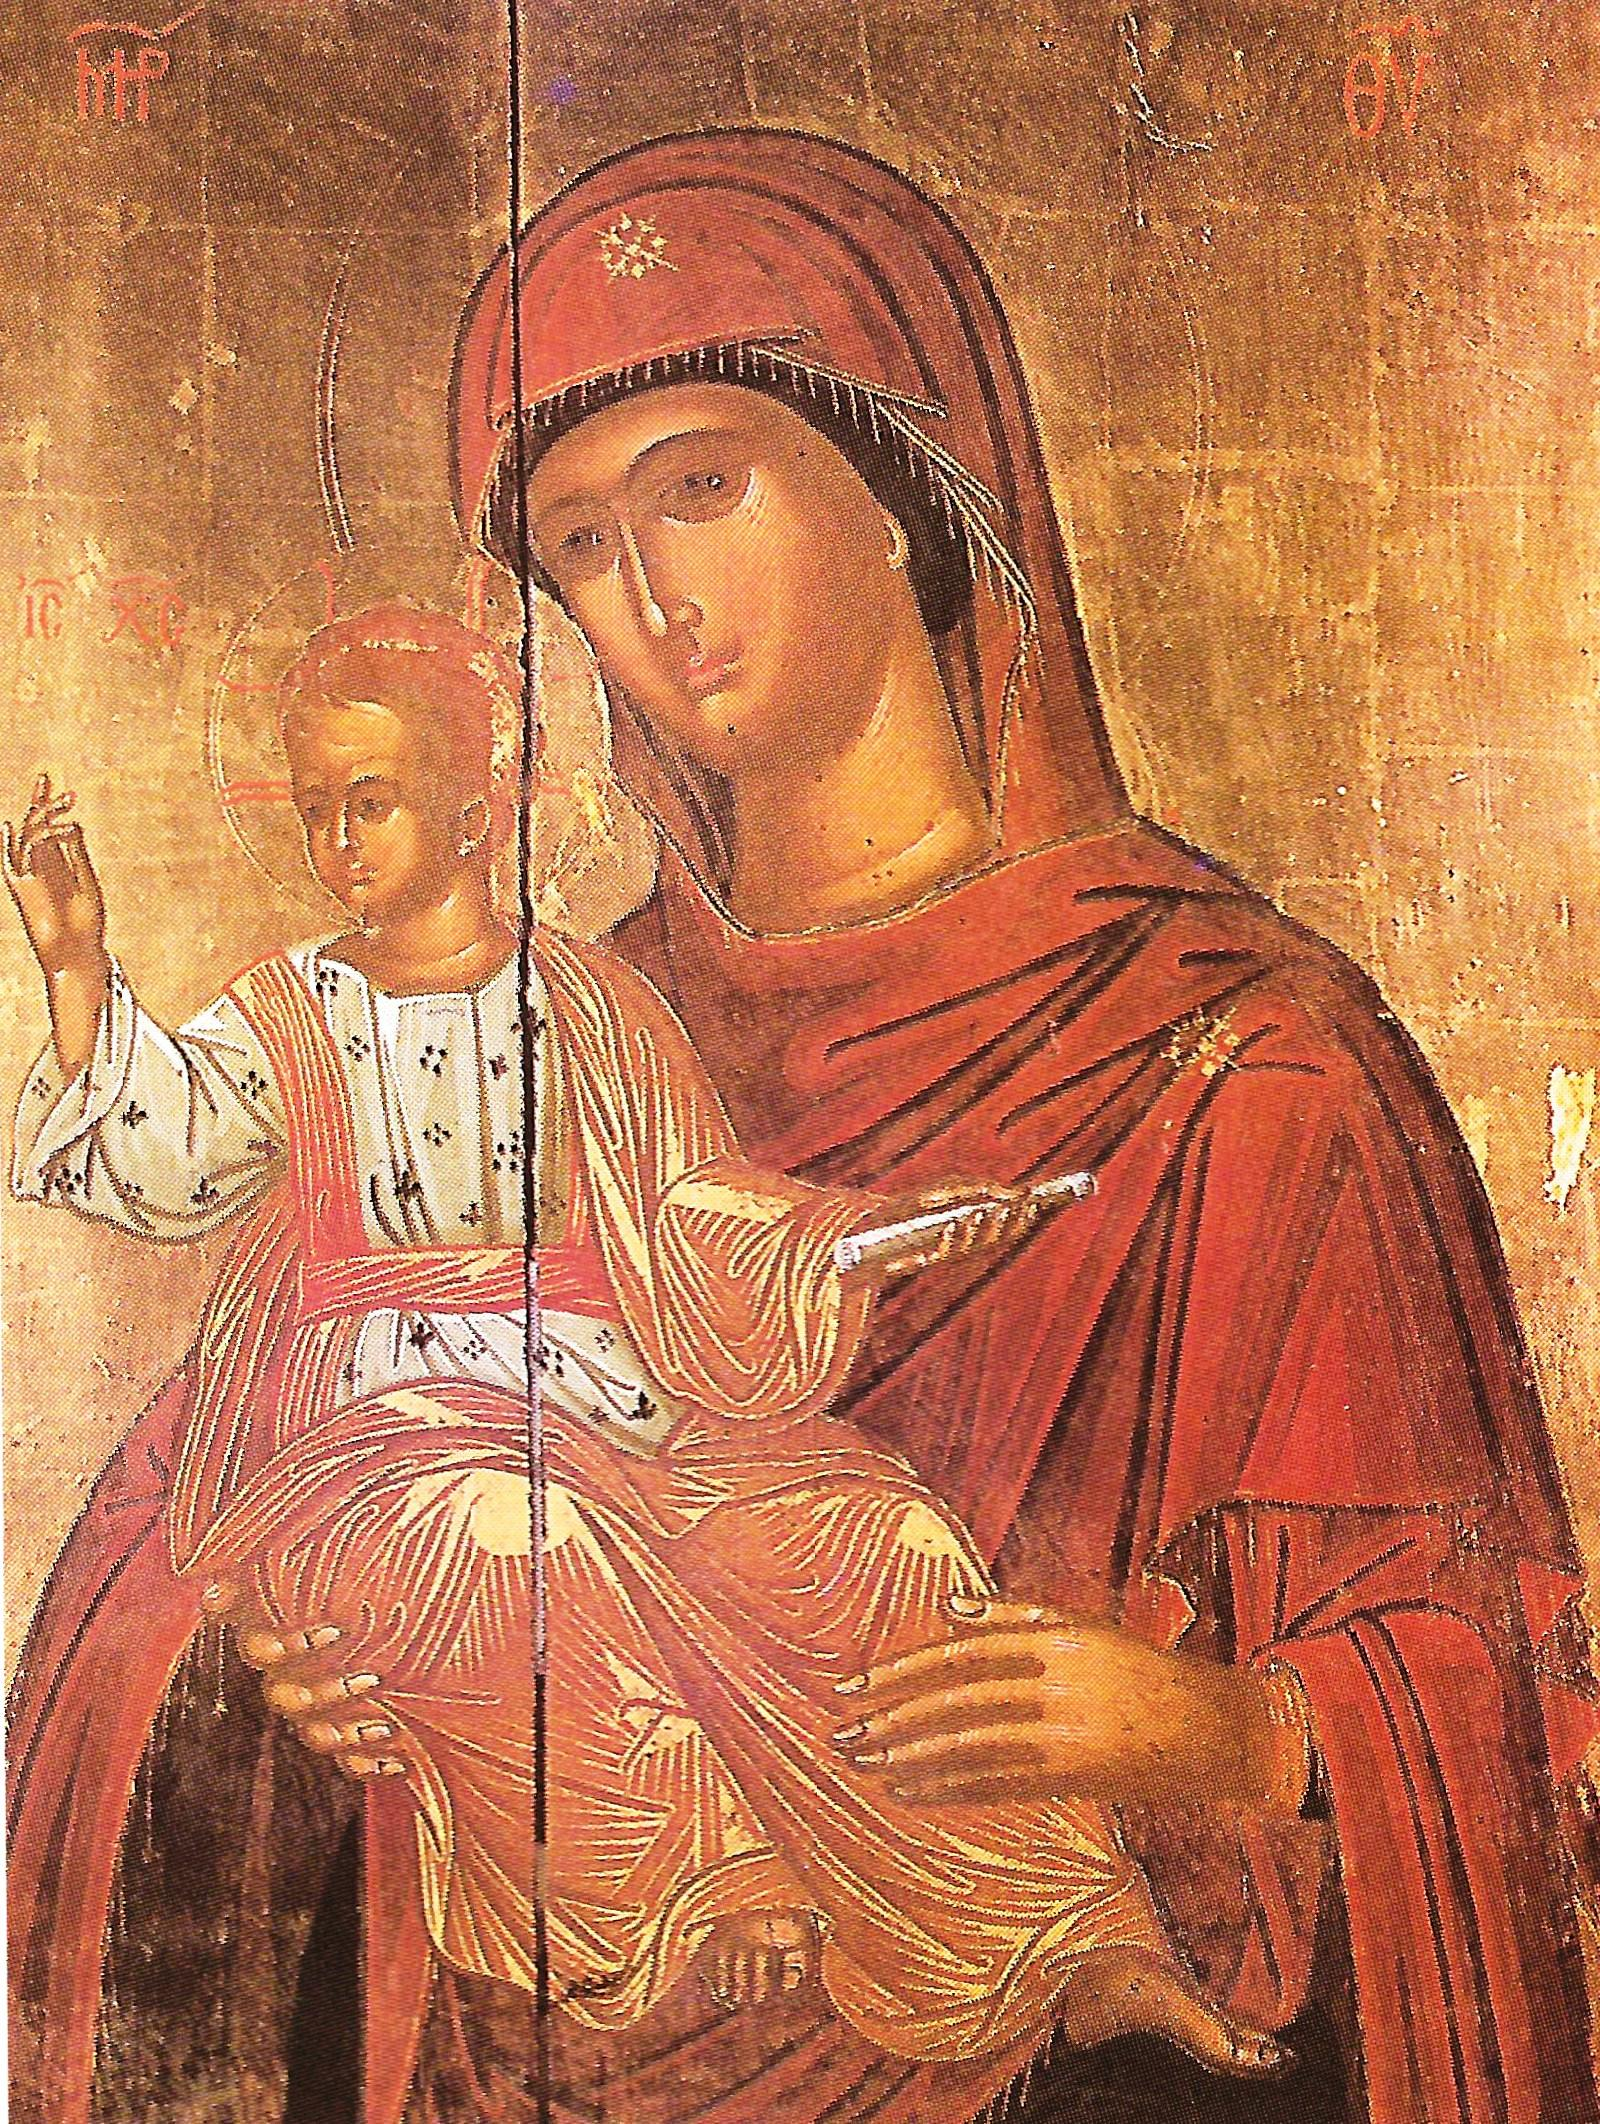 MoΗ Παναγία. Φορητή εικόνα (ιστ΄ αιώνα) στο τέμπλο του κυρίως ναού του καθολικού.ni Megalou Meteorou, Meteora_04